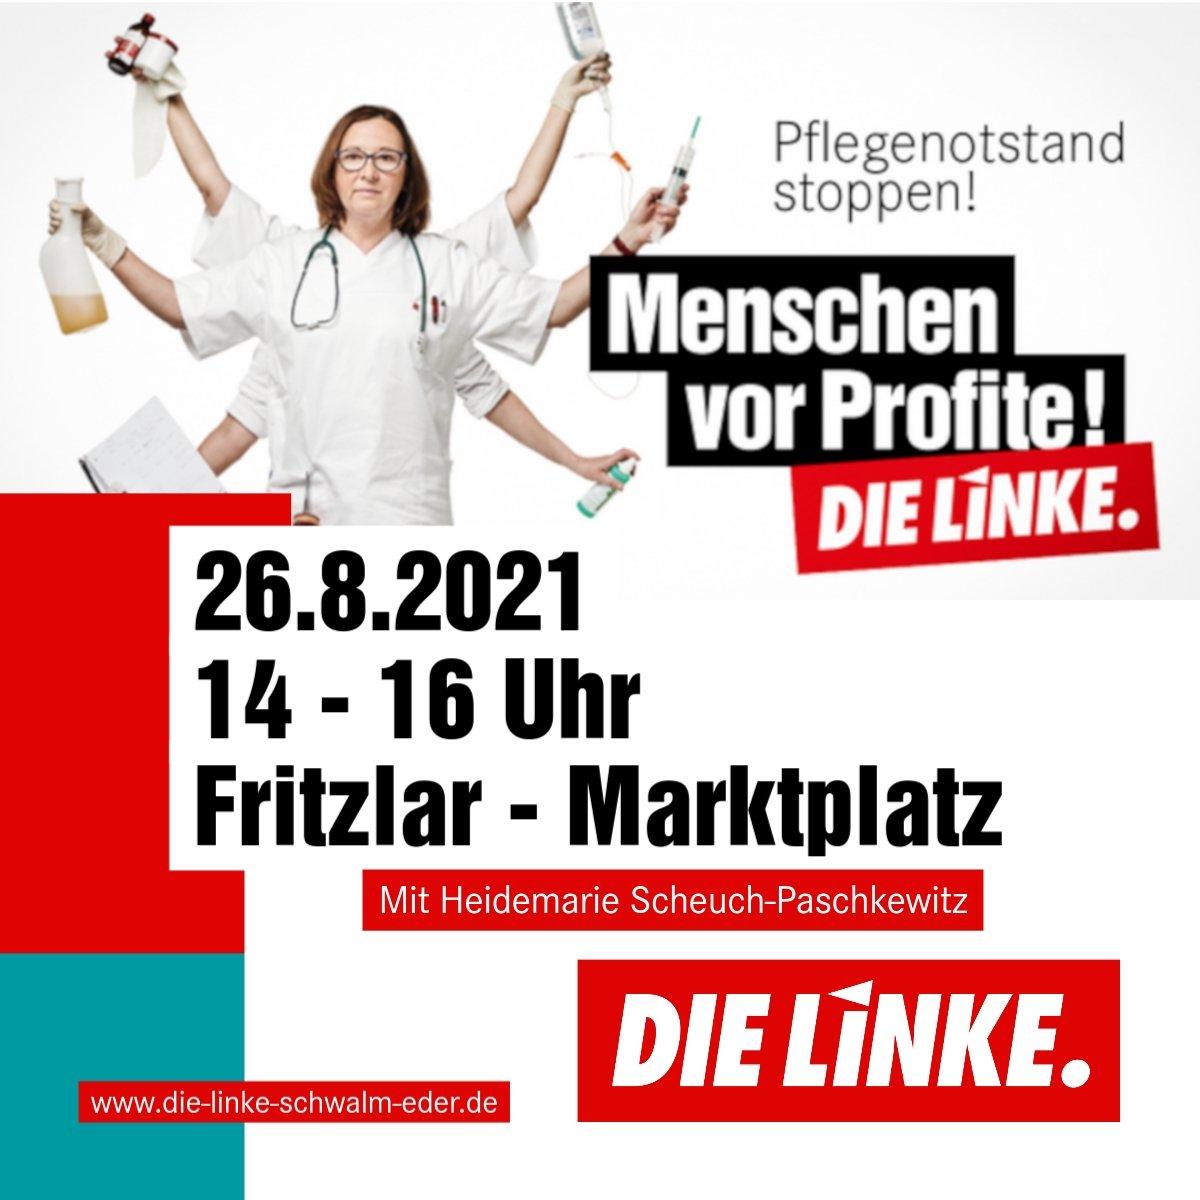 Pflegeaktion Fritzlar